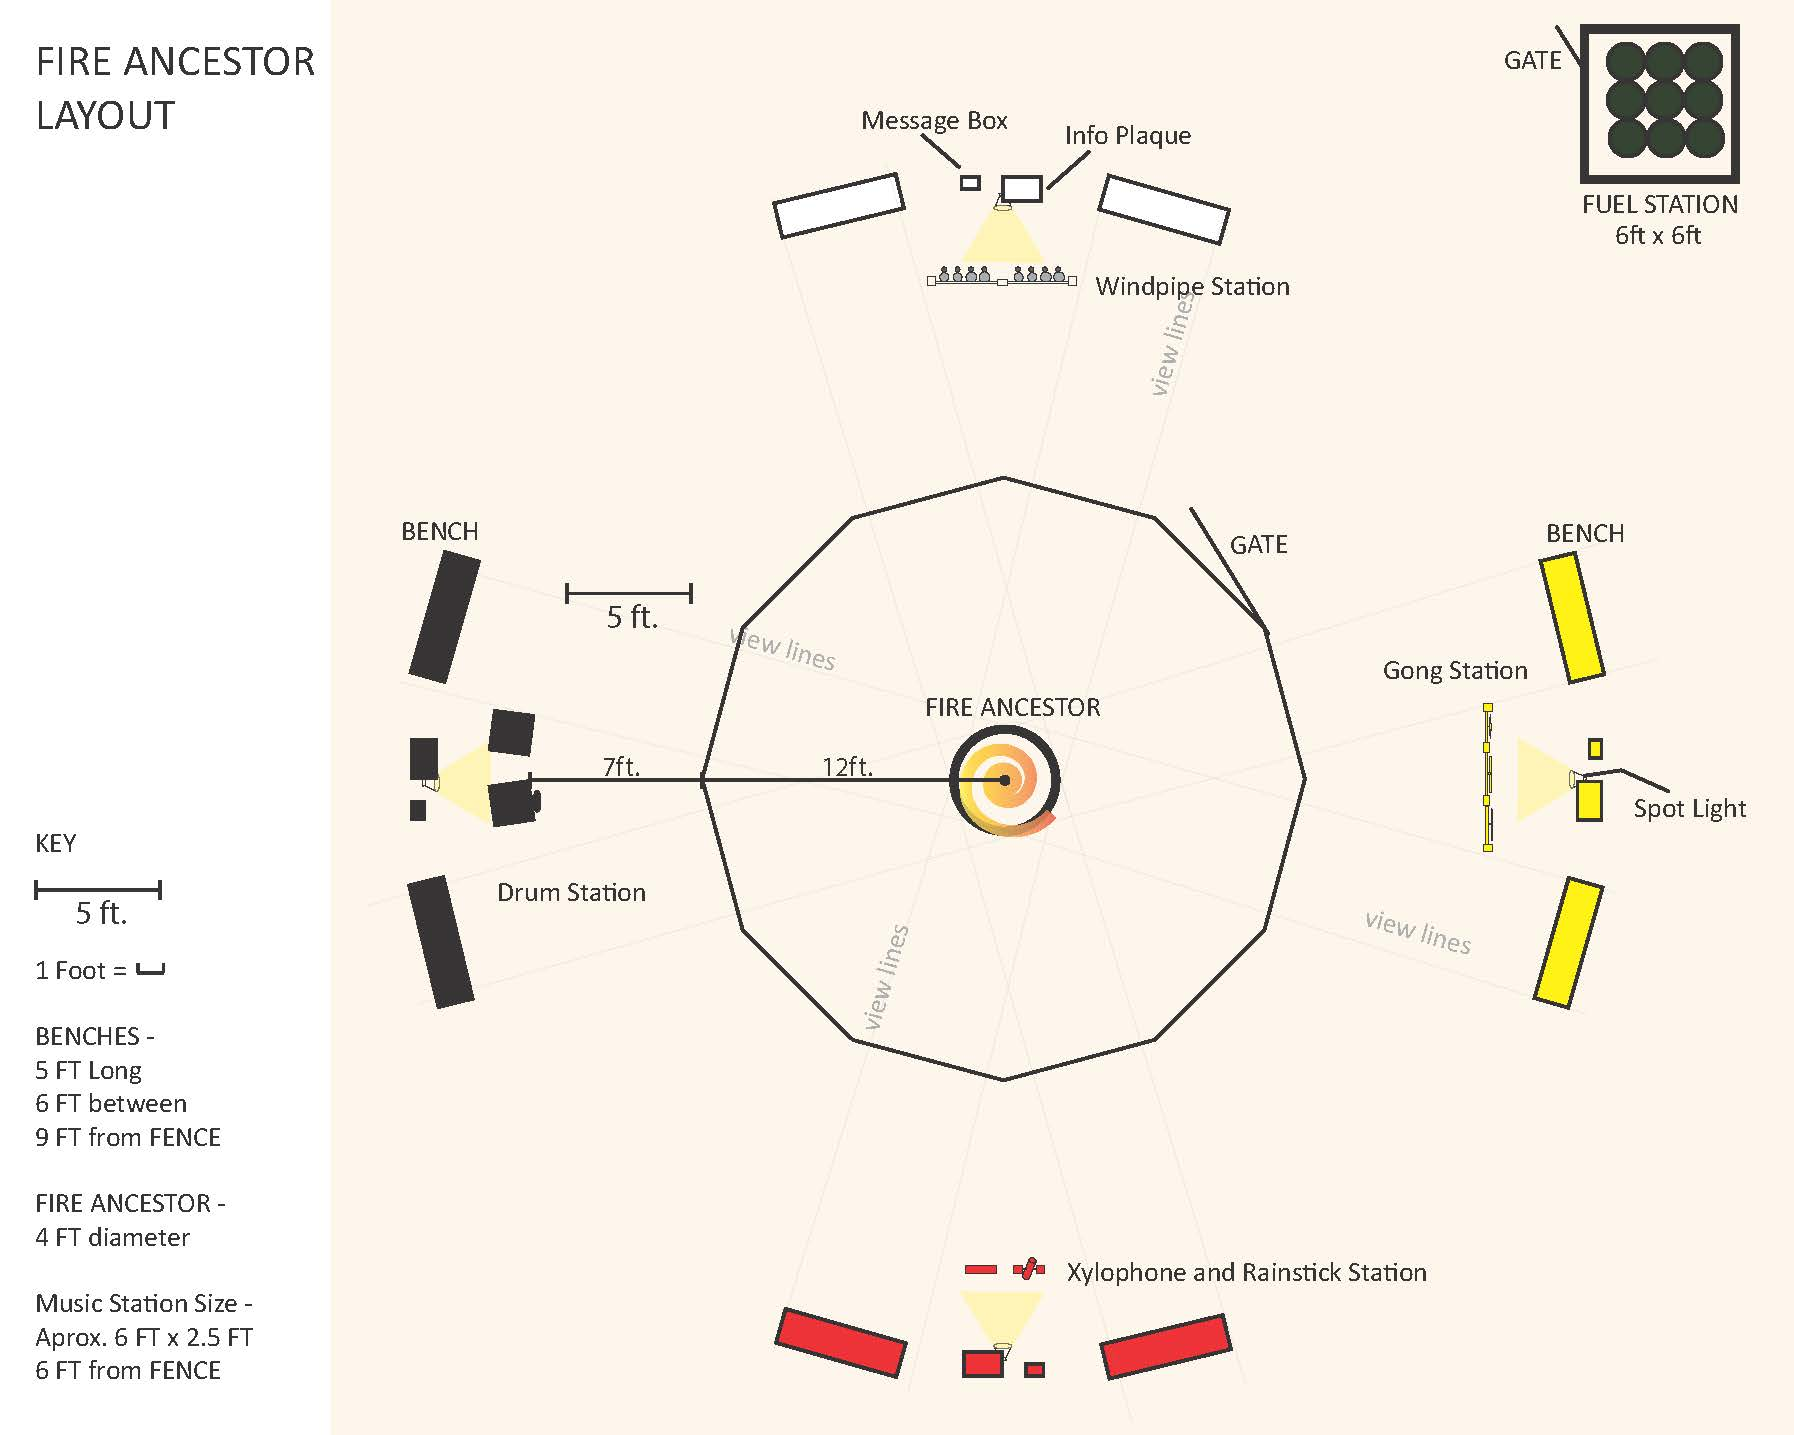 Fire Ancestor Layout.jpg